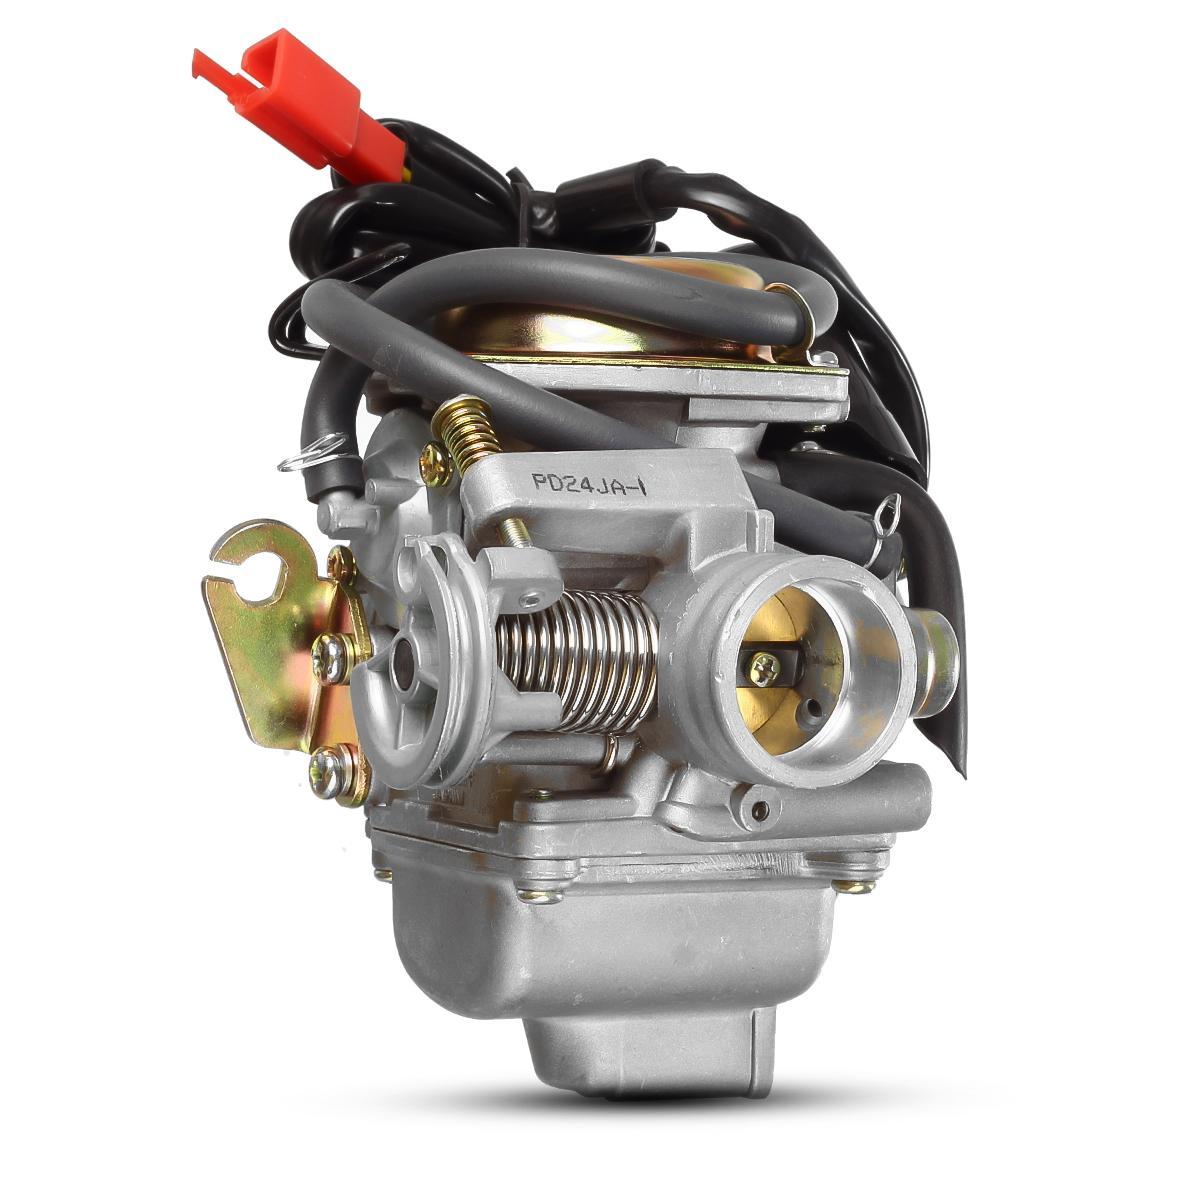 new carburetor for eton yukon cxl 150 atv quad carb. Black Bedroom Furniture Sets. Home Design Ideas